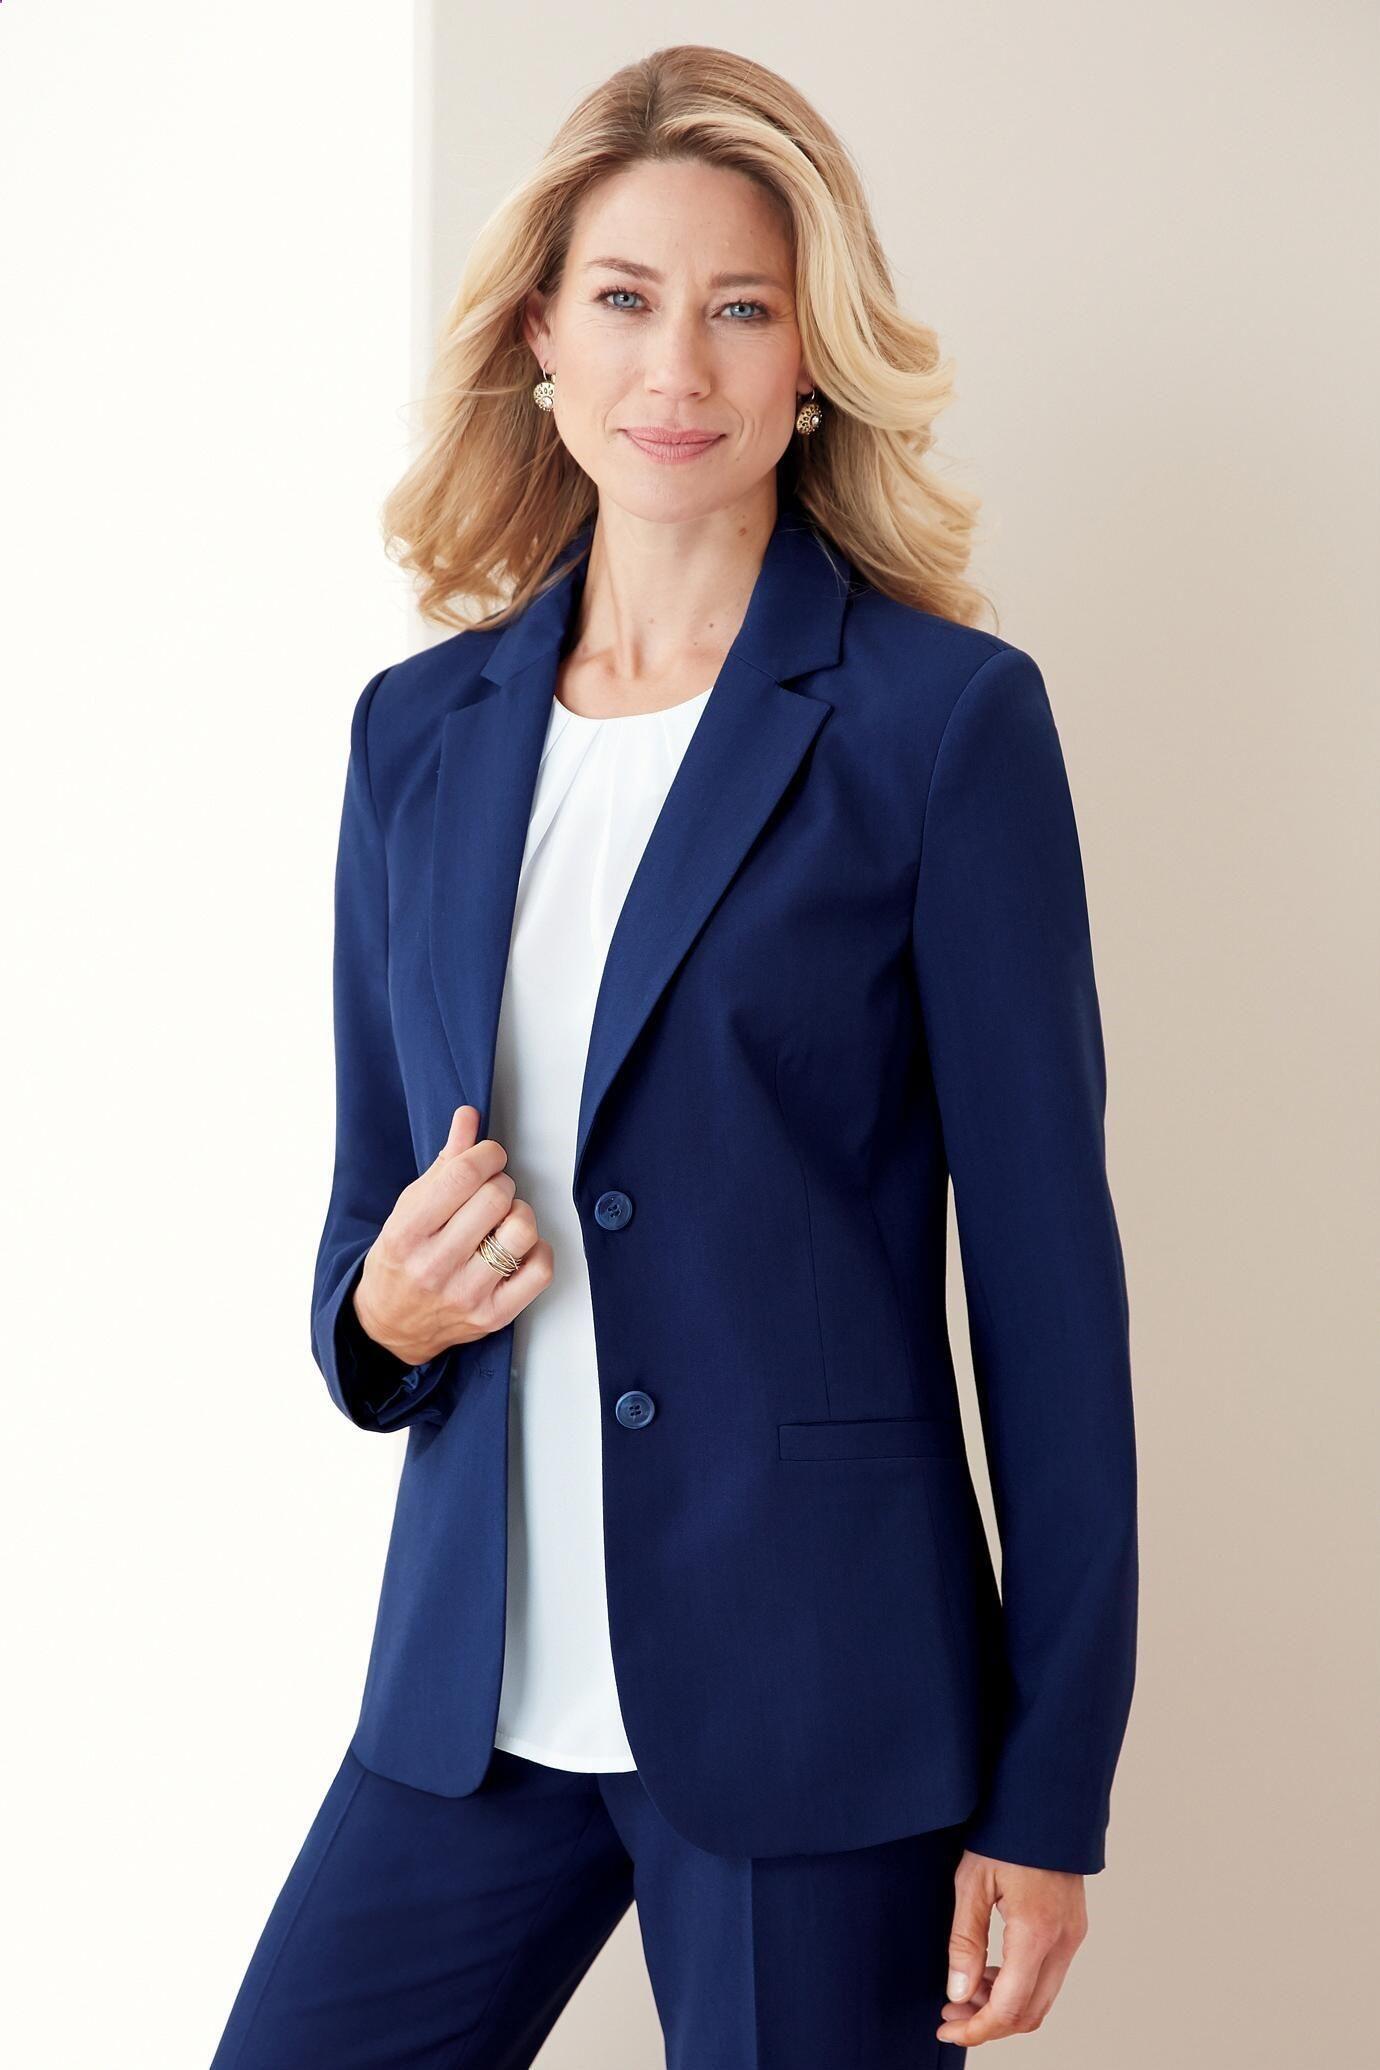 Women Blazer Suit Office Business Coat Long Sleeve Classical Formal Jacket Tops